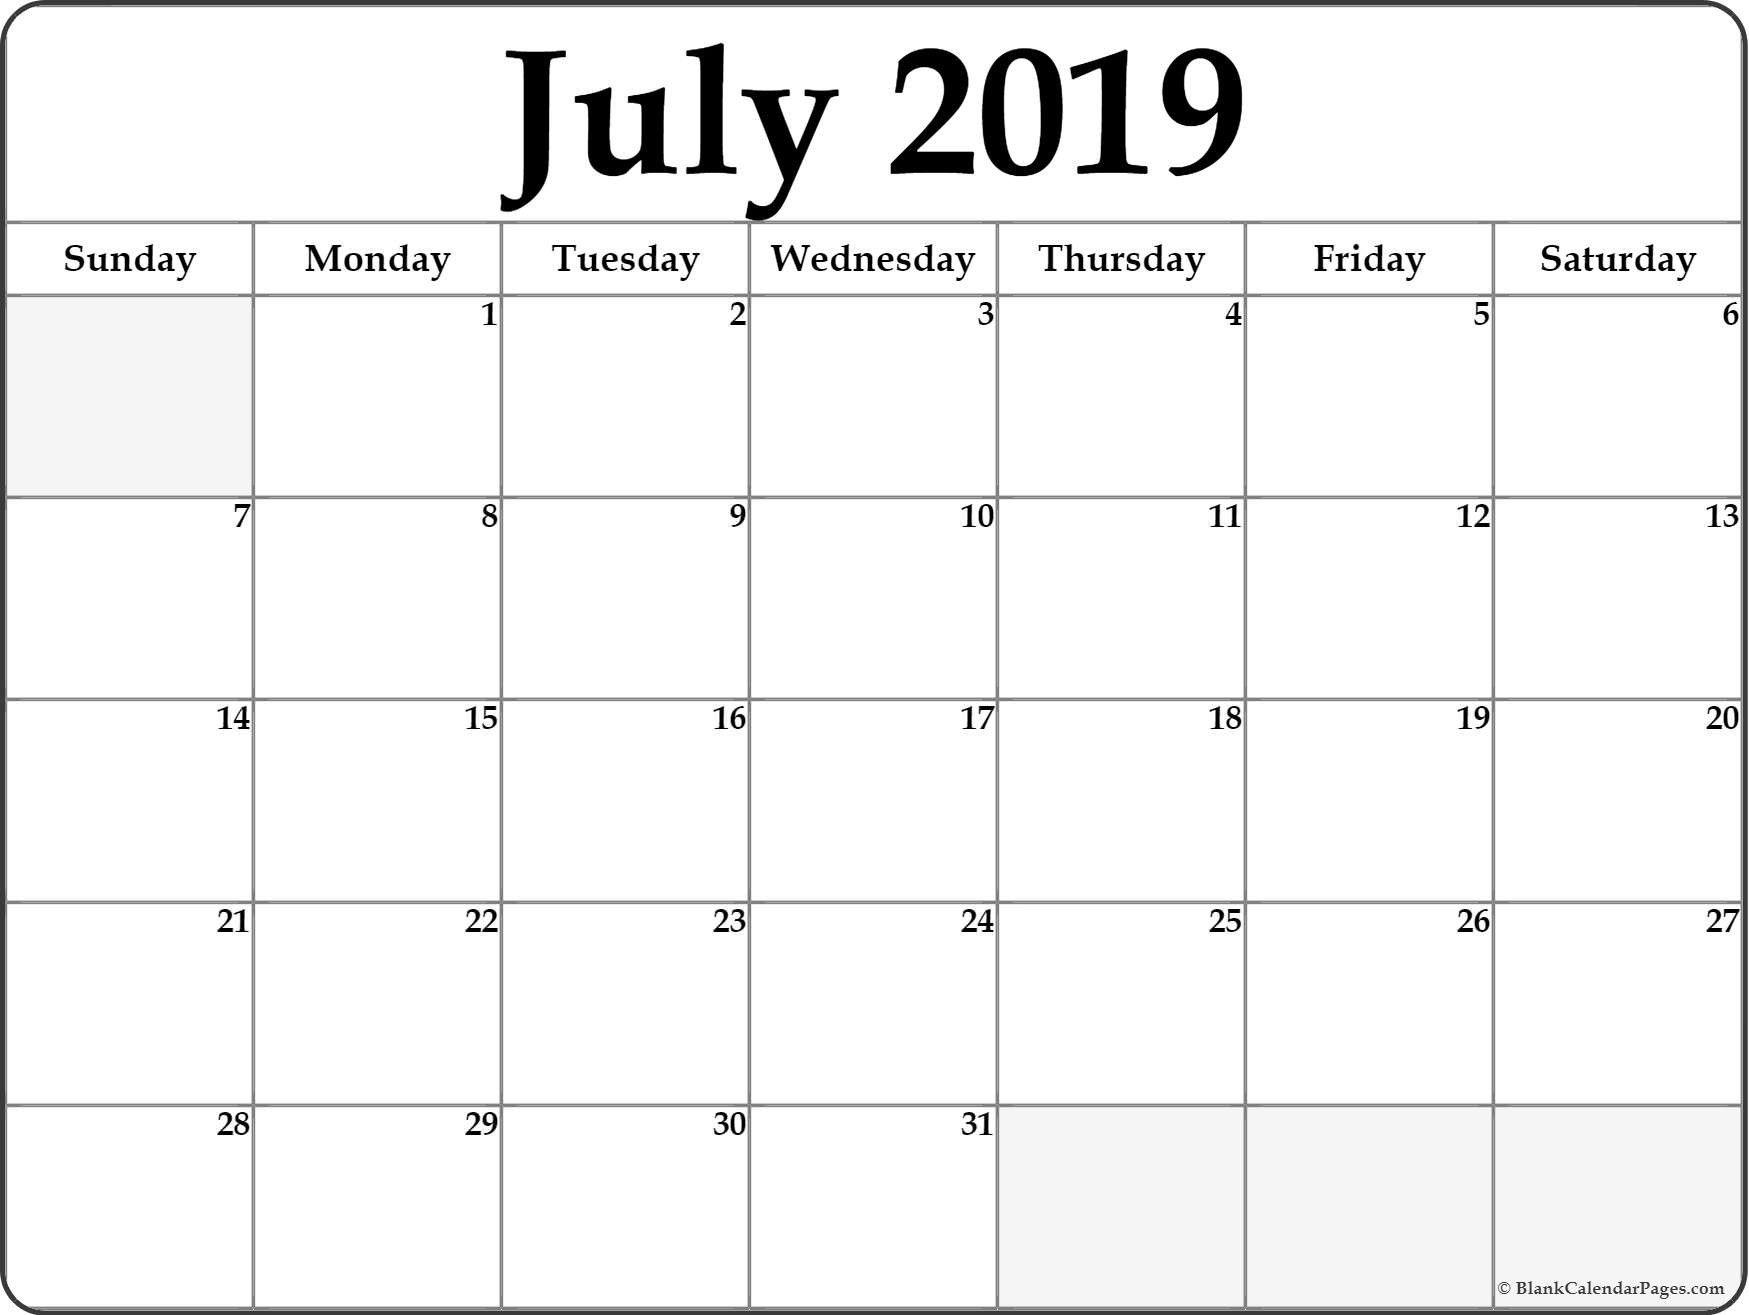 Blank Calendar July 2019 Printable | 100+ July 2019 Calendar